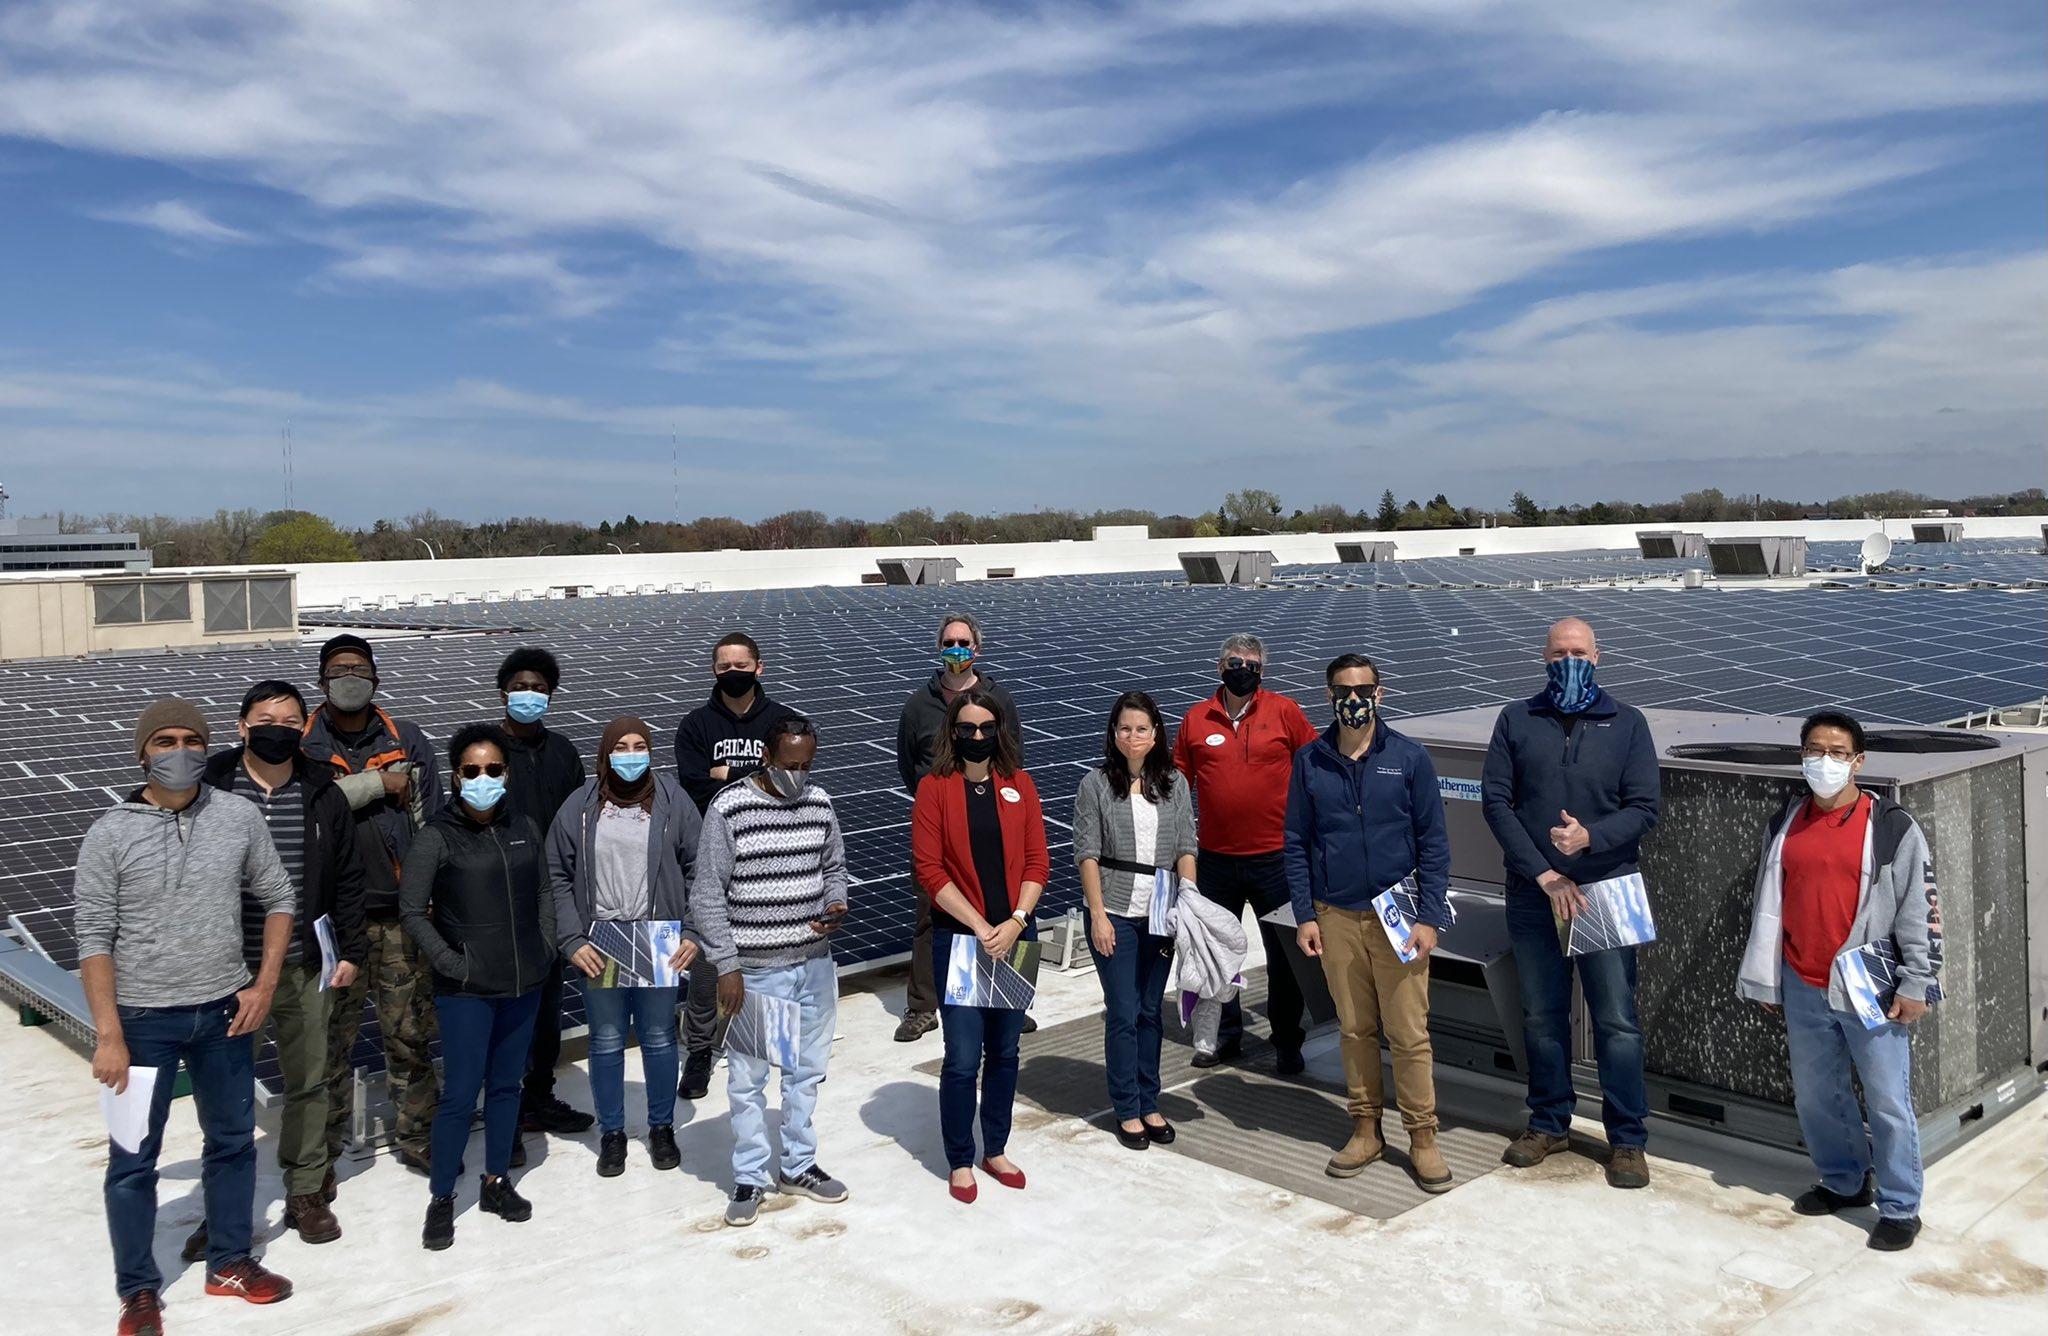 Recent Summit Academy Grads, IPS team members, and Target representatives